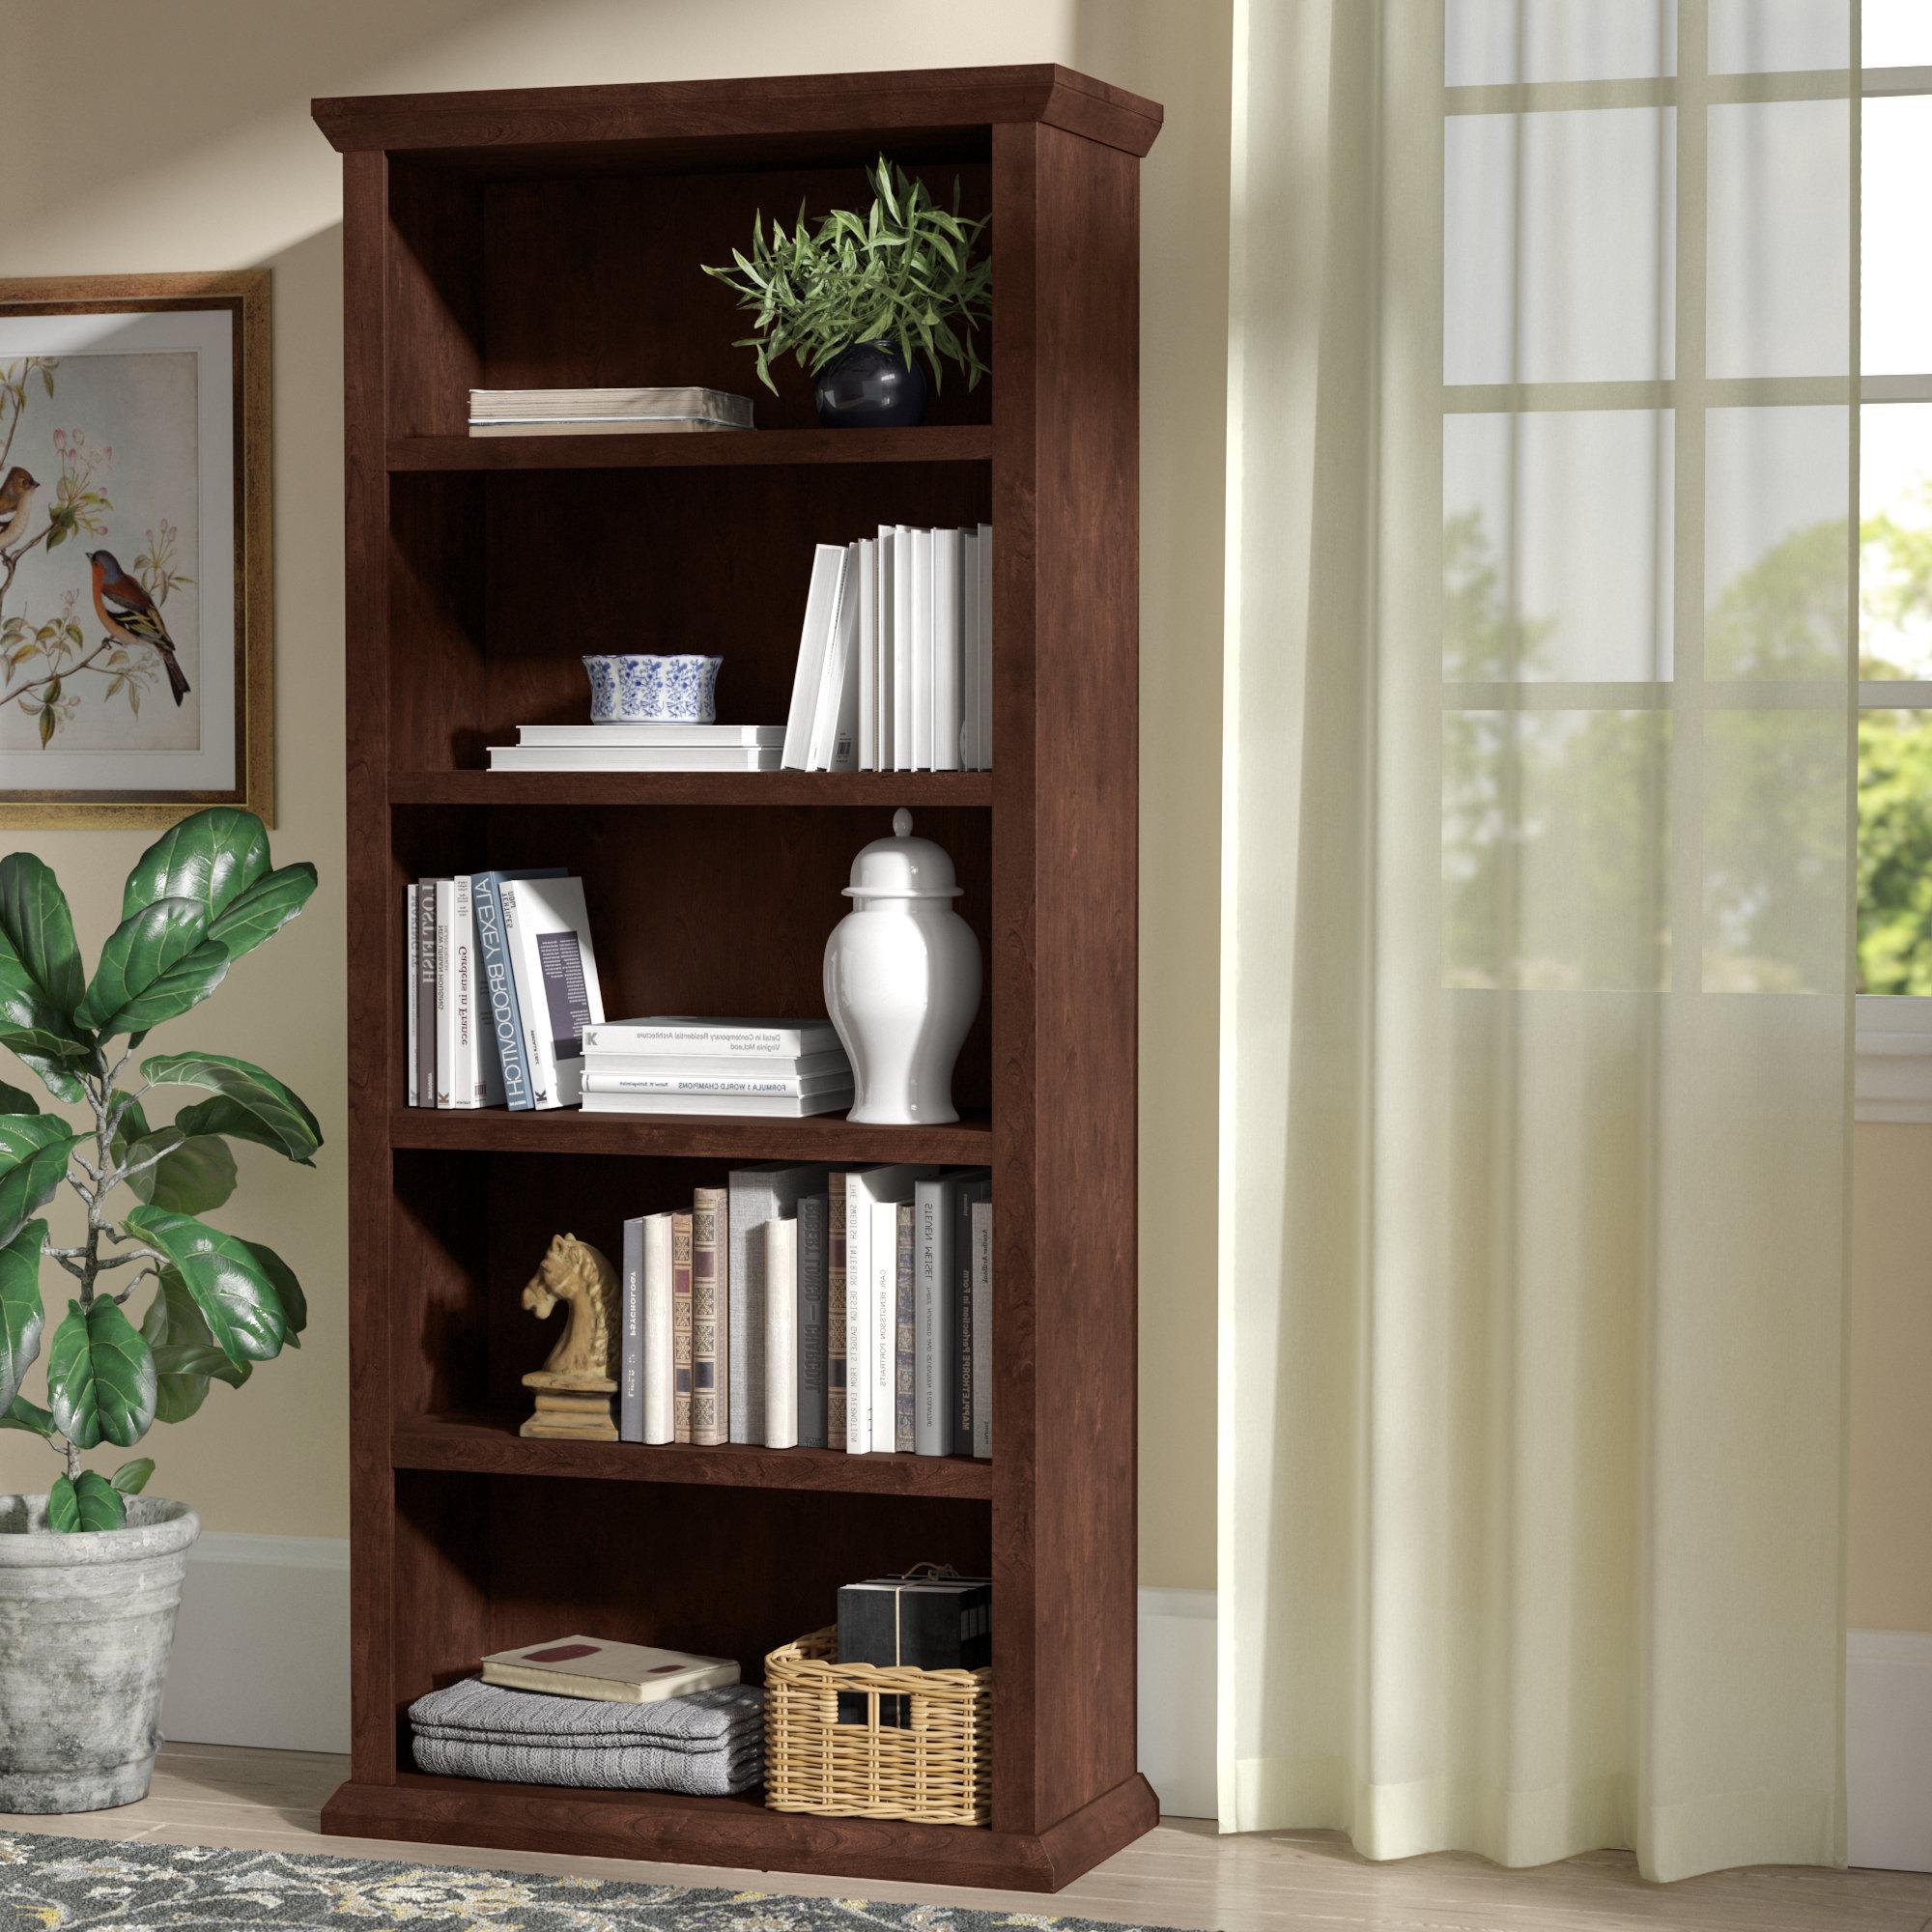 Newest Ferrell Standard Bookcase Regarding Kirkbride Standard Bookcases (View 20 of 20)